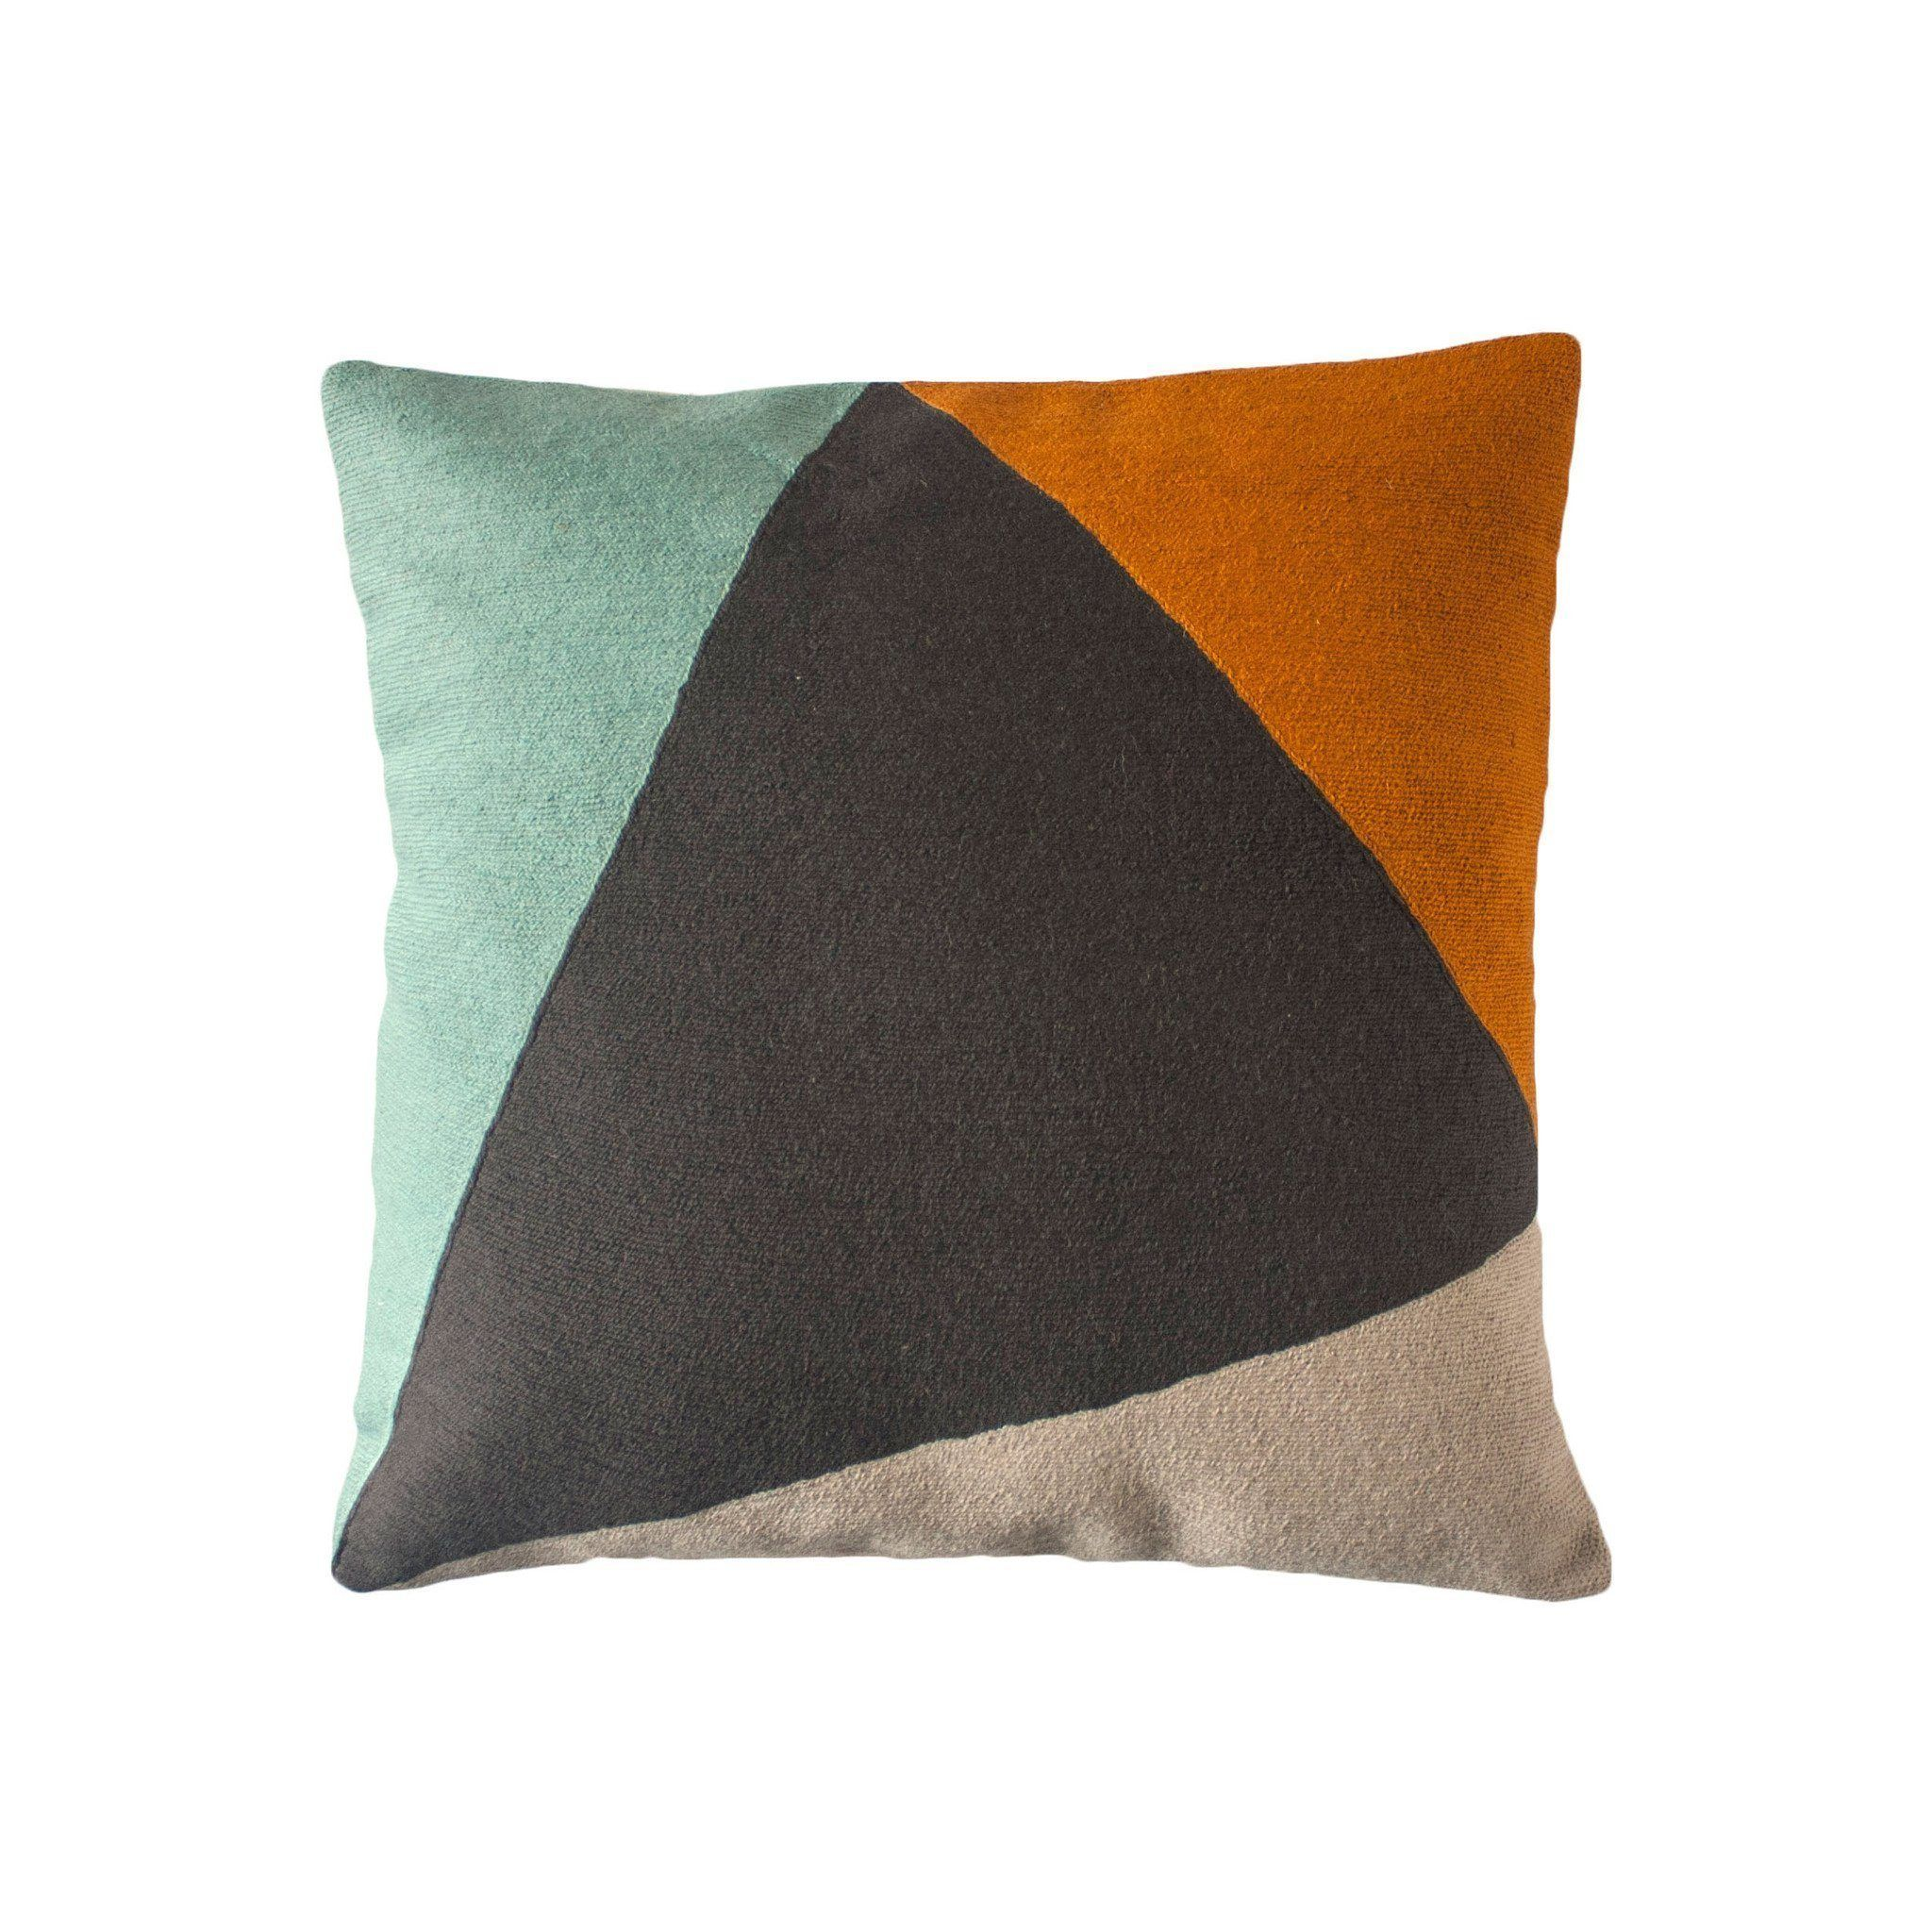 Leah Singh Phoenix Colorblock Pillow - Gray